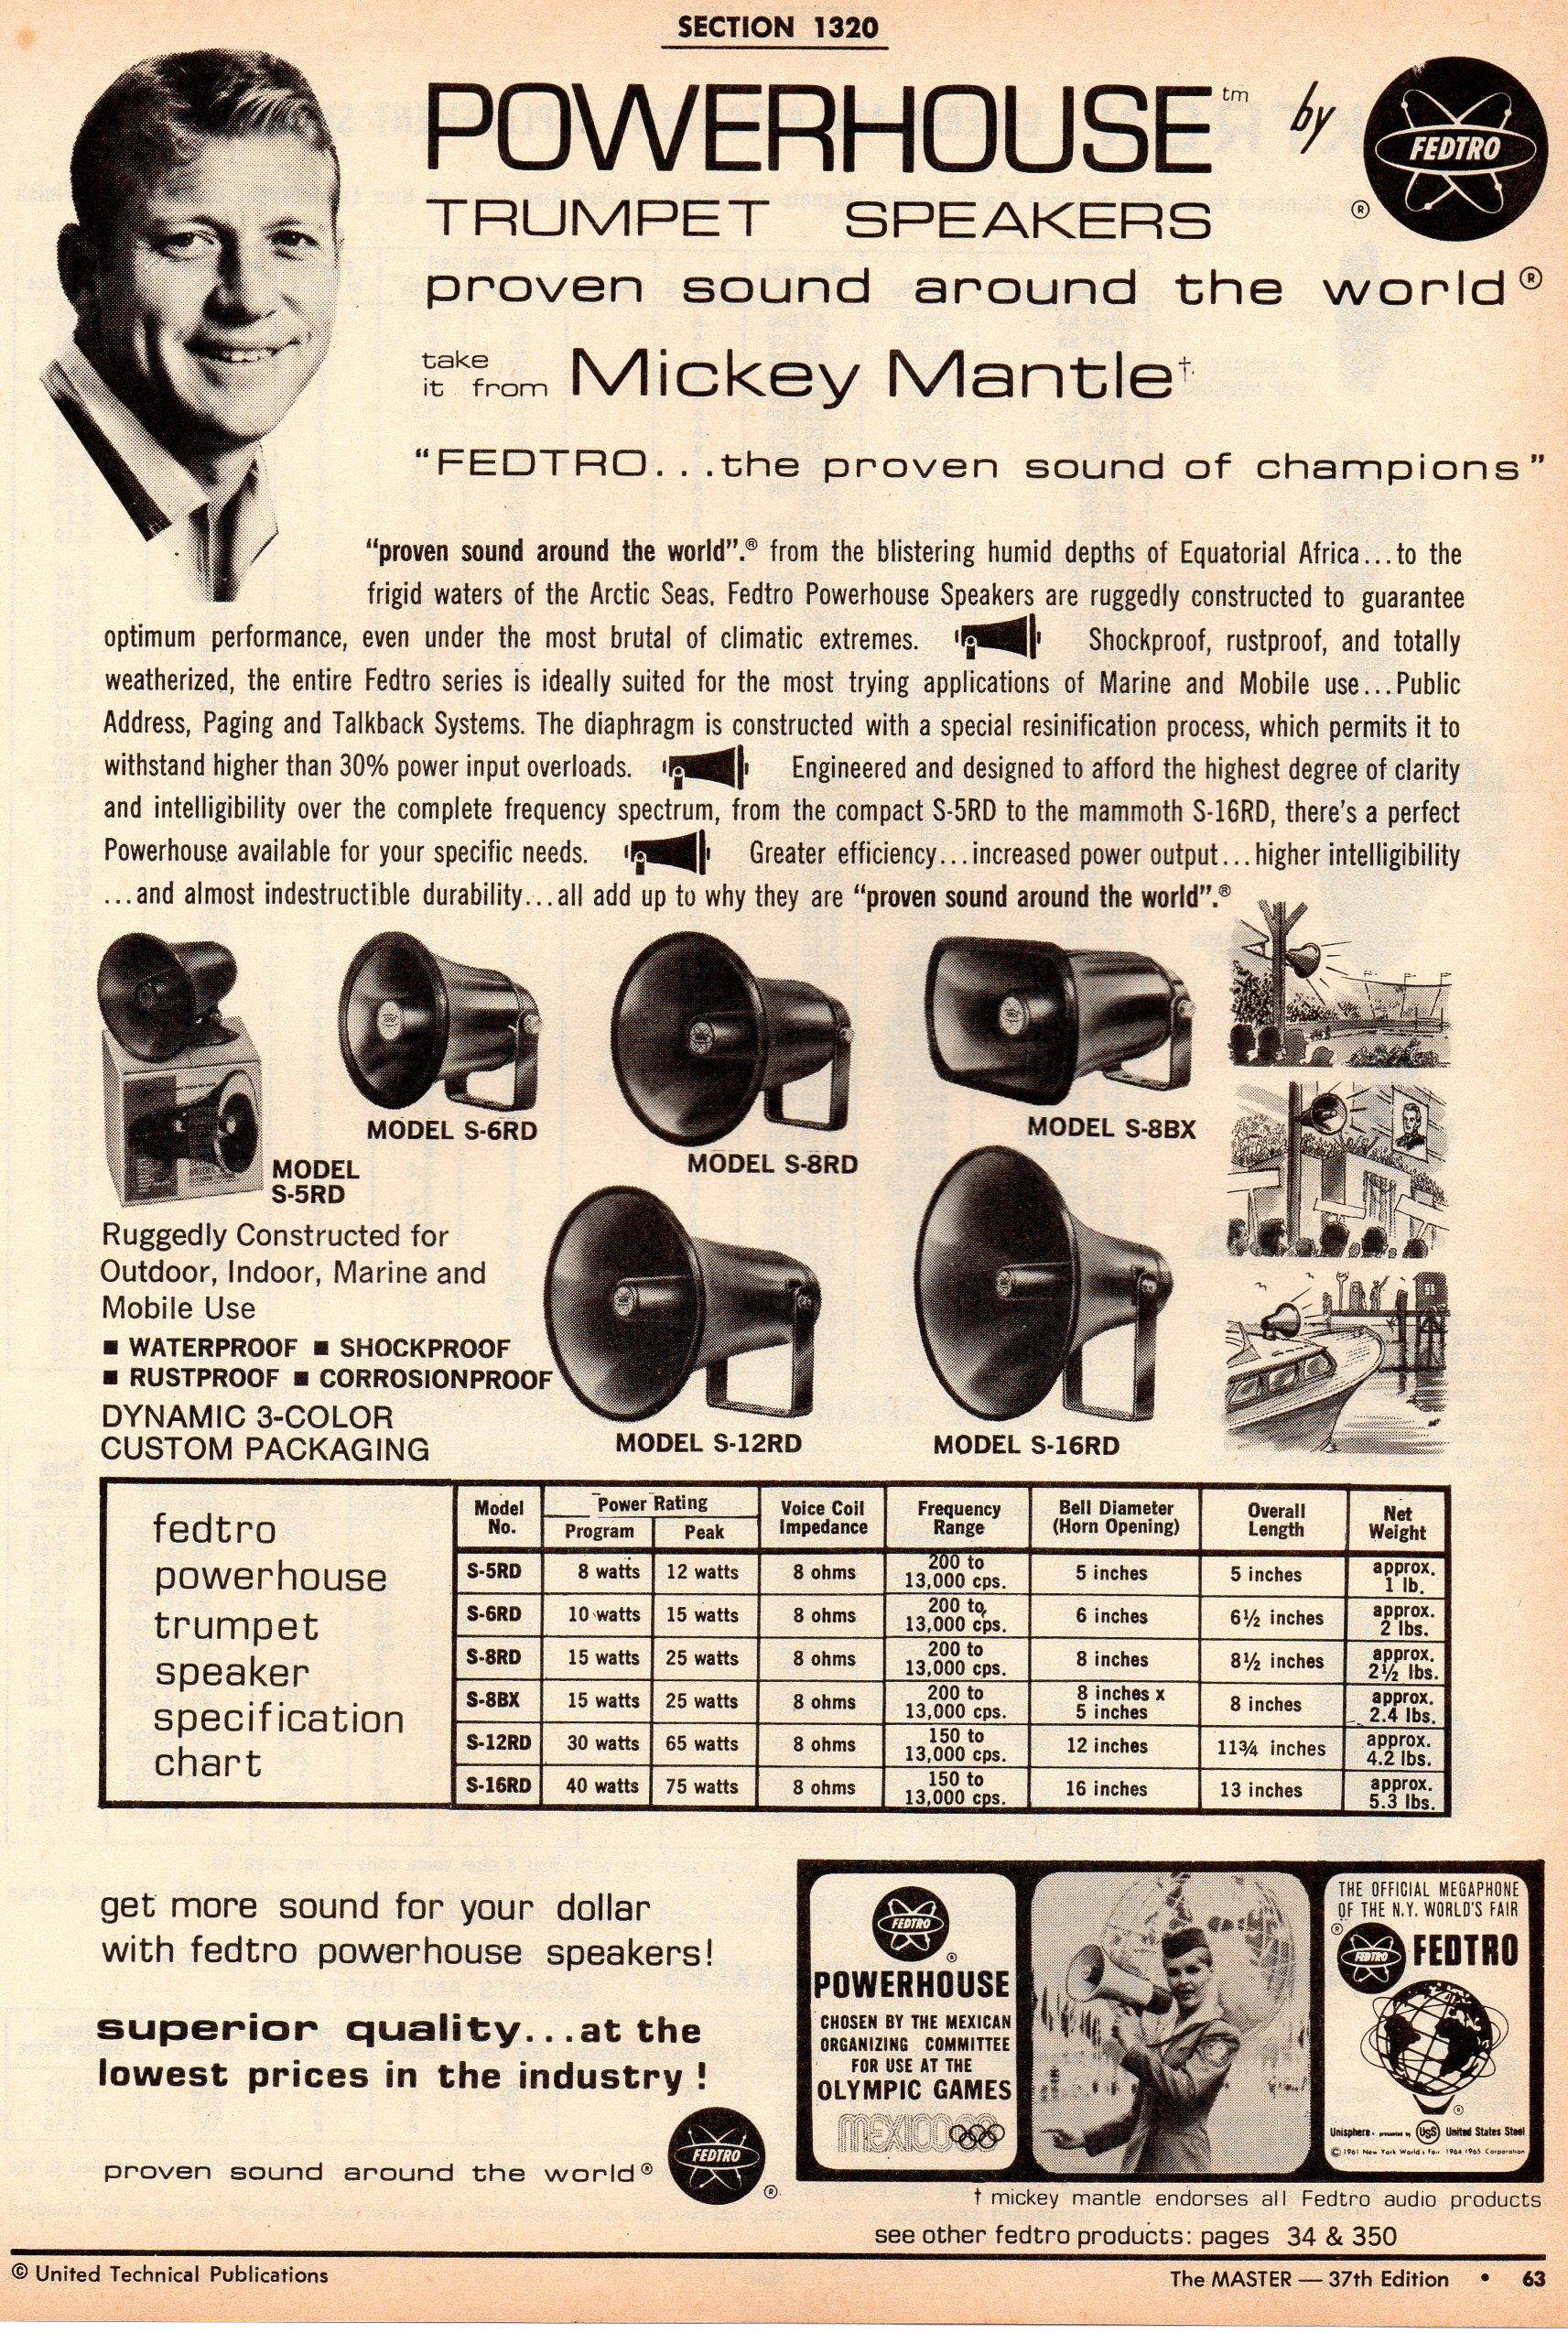 1968-71 era united technical publications 37th edition